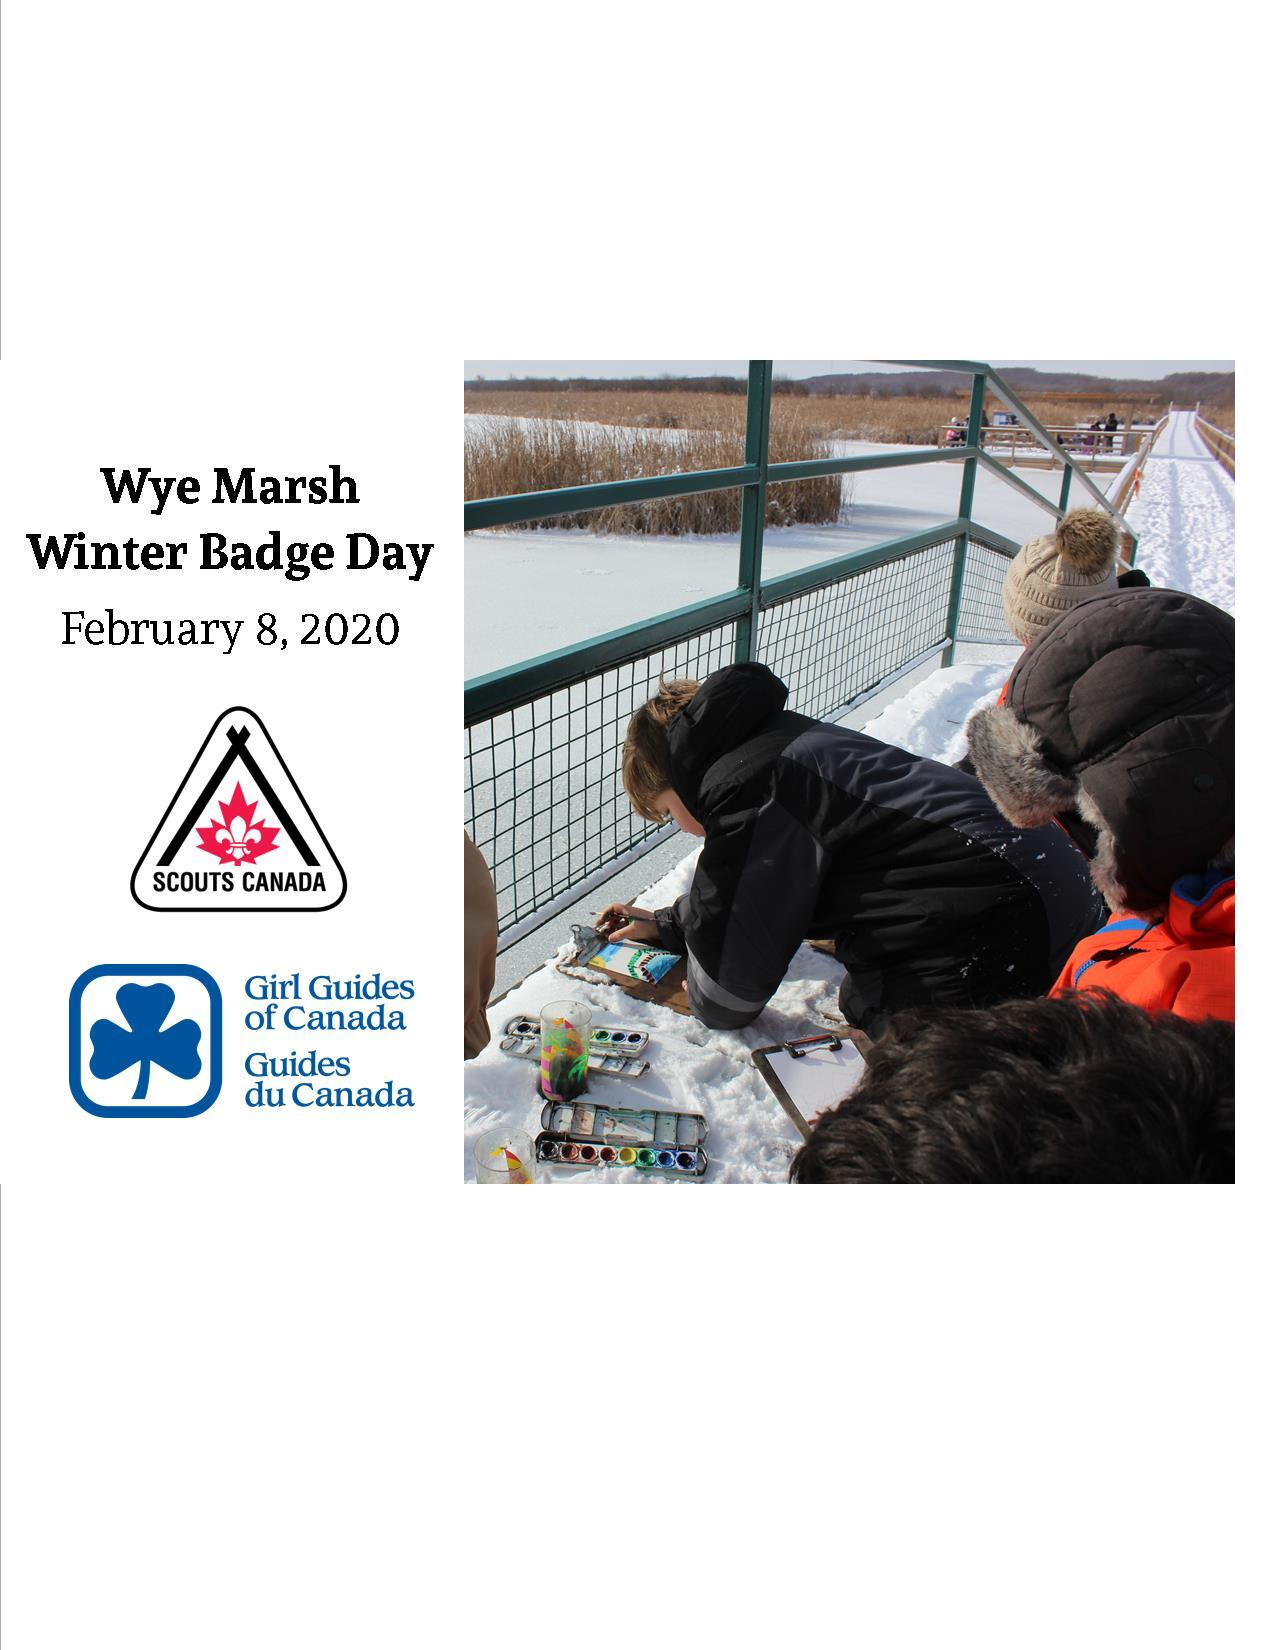 Wye Marsh Winter Badge Days - BADGE DAYS AT WYE MARCH: WINTER